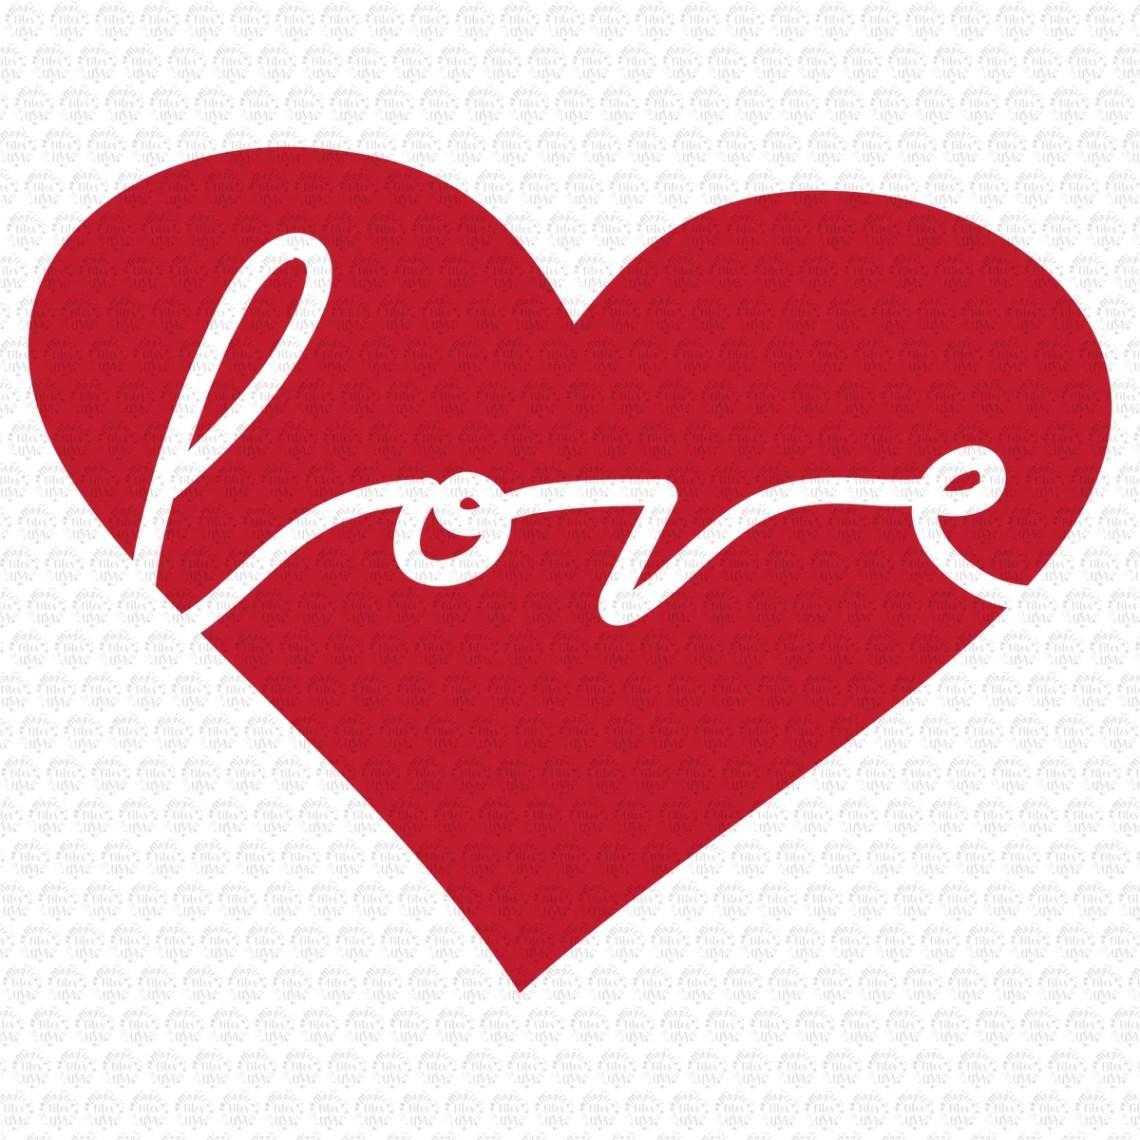 Download Love Svg, Heart Svg, Valentine Hearts Svg, Valentines´s ...